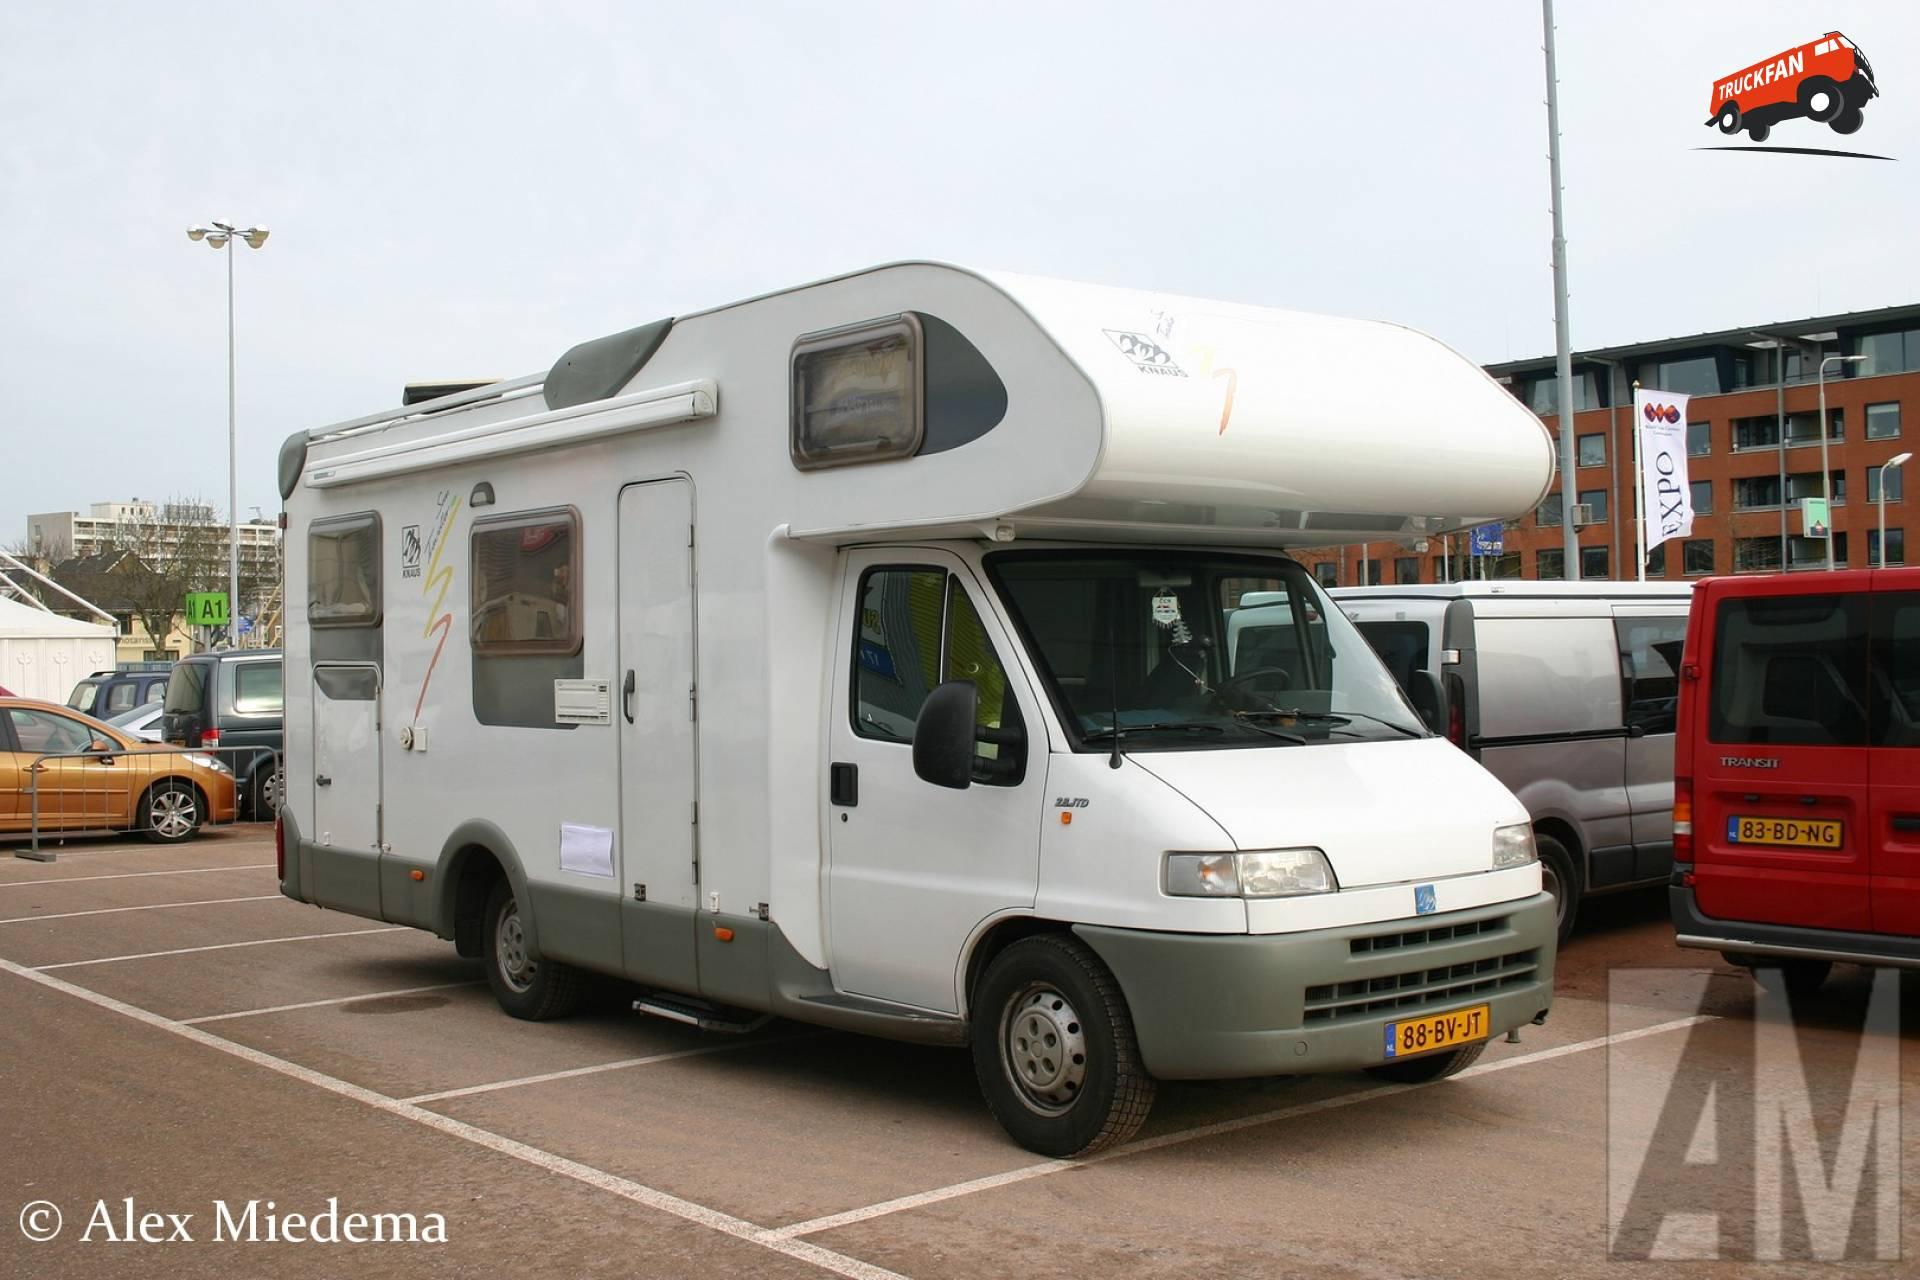 Knaus camper